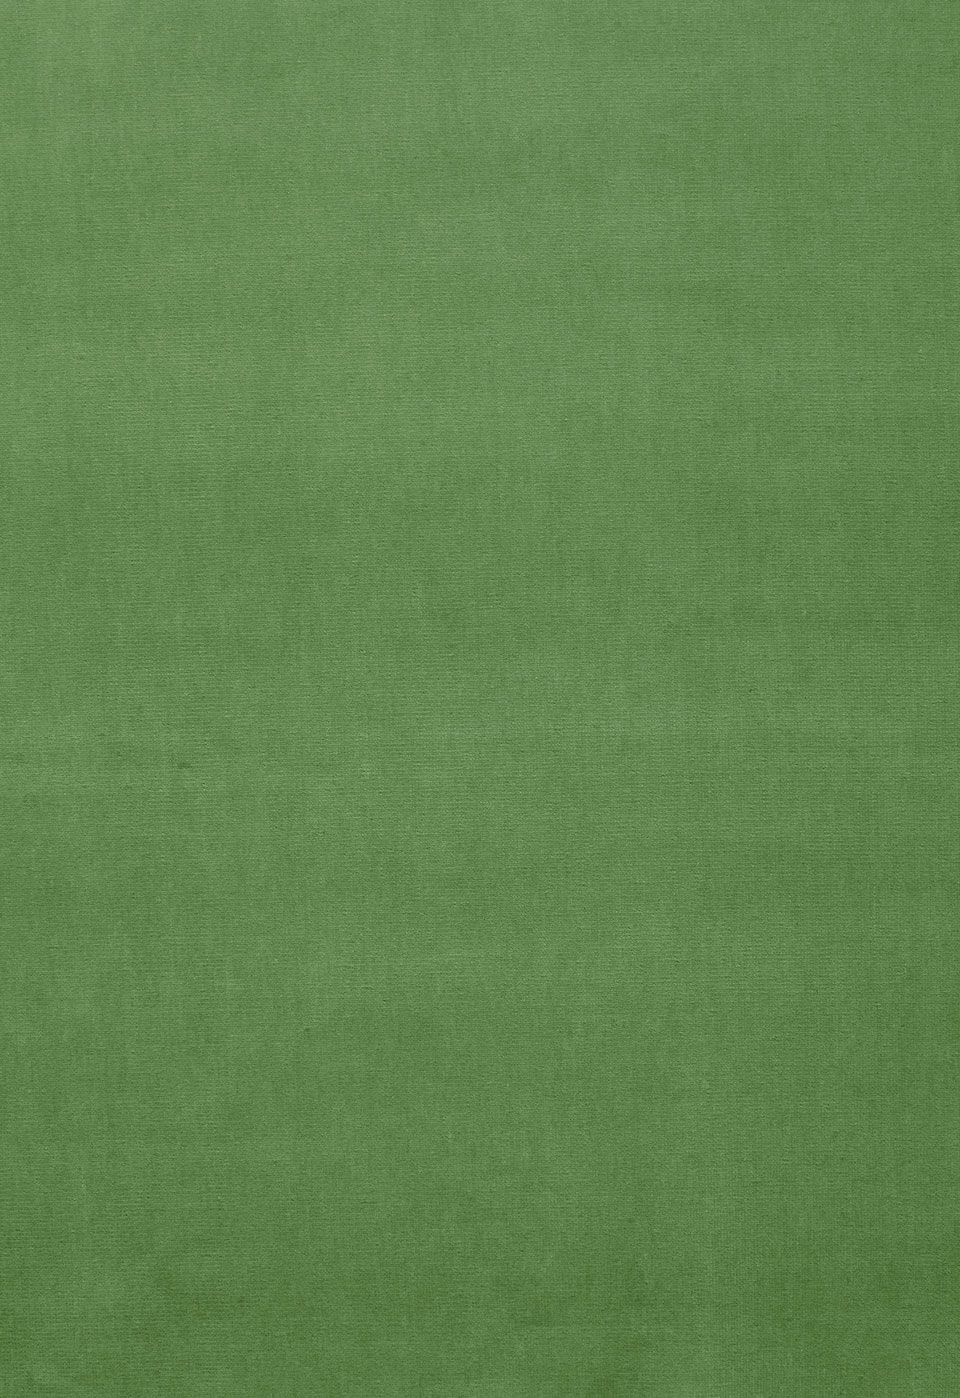 Fabric | Gainsborough Velvet in Parrot | Schumacher